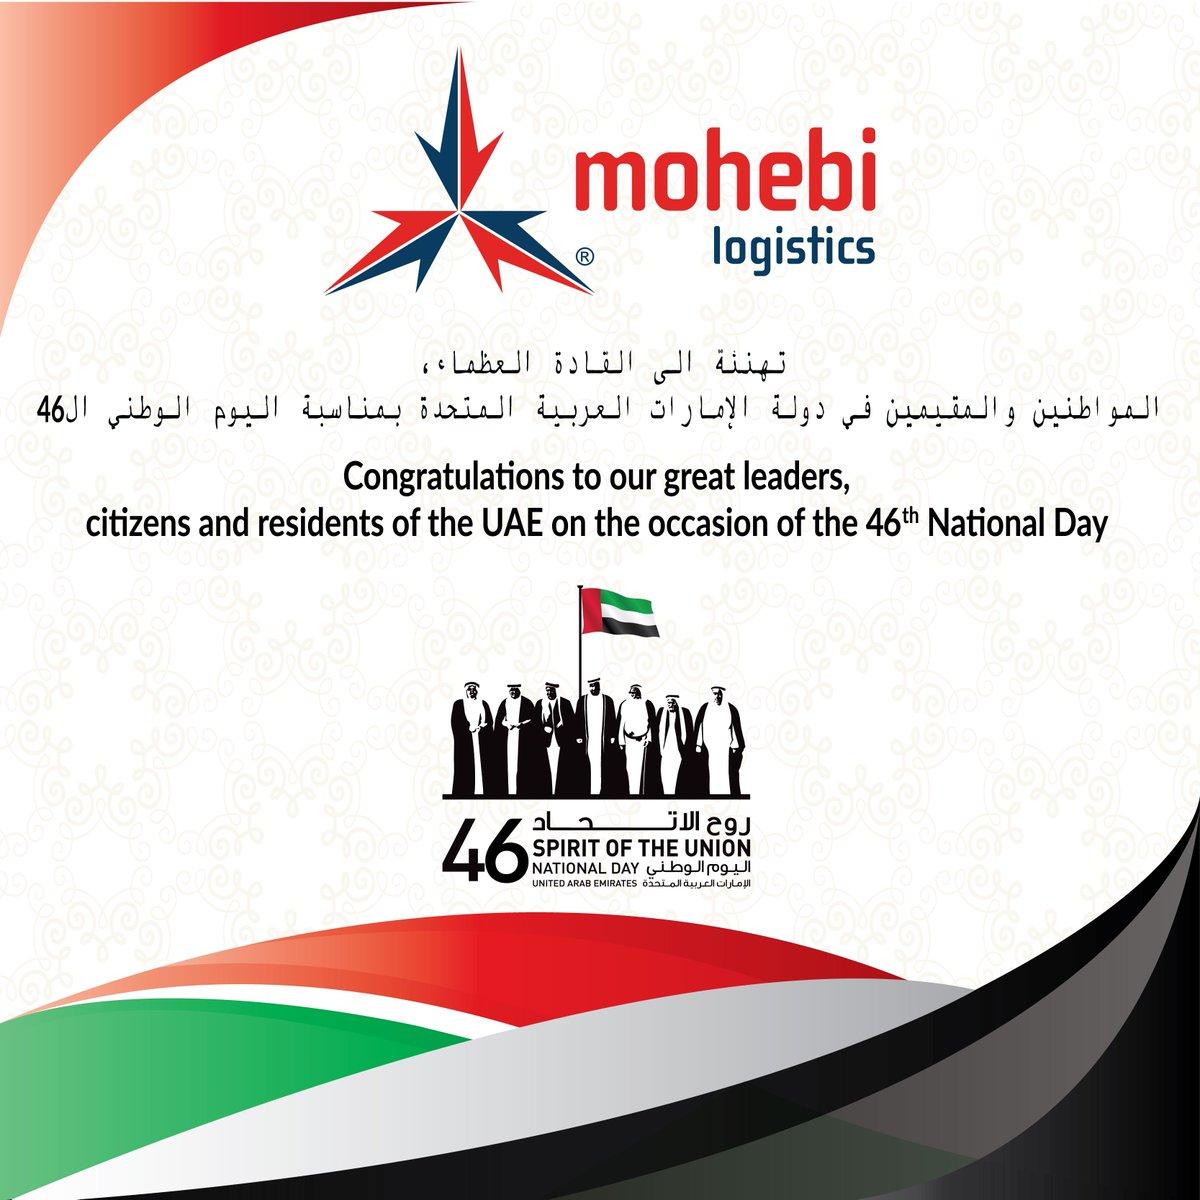 Mohebi Logistics on Twitter: